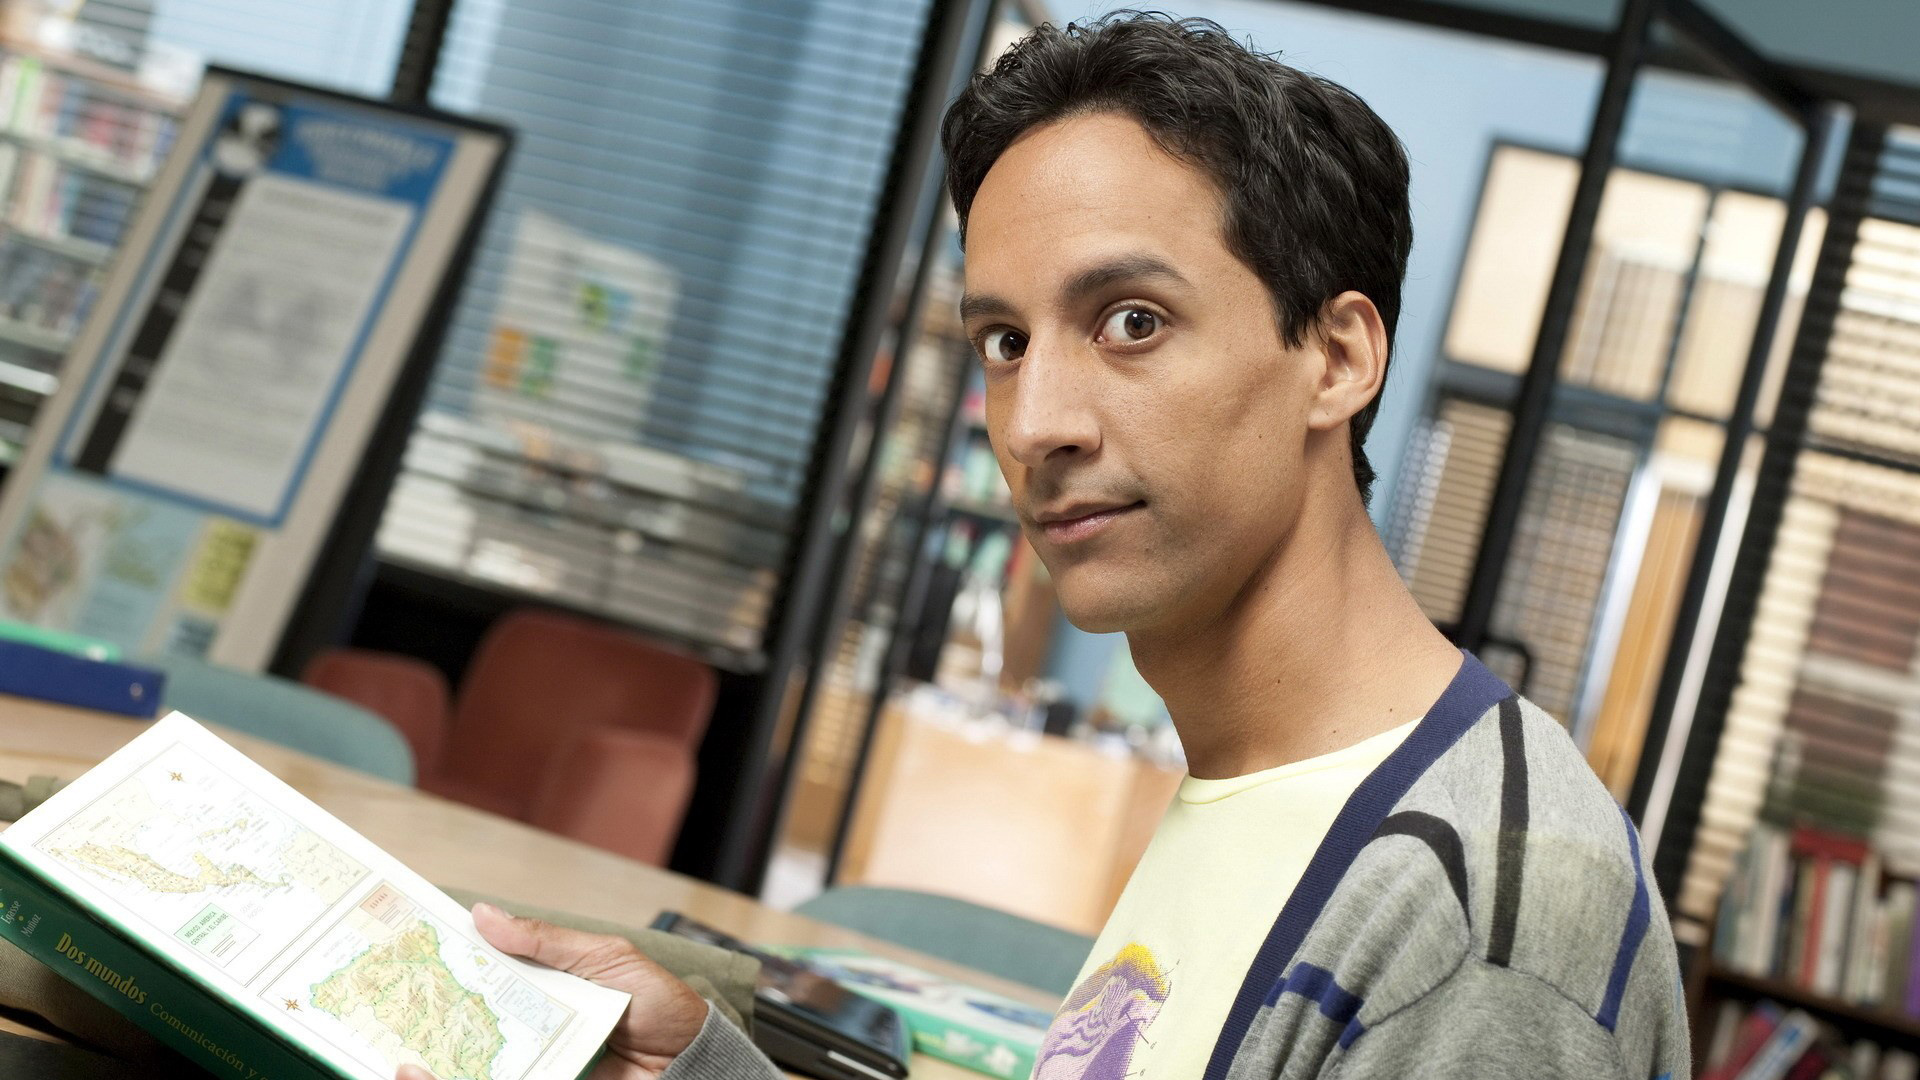 Community = Abed